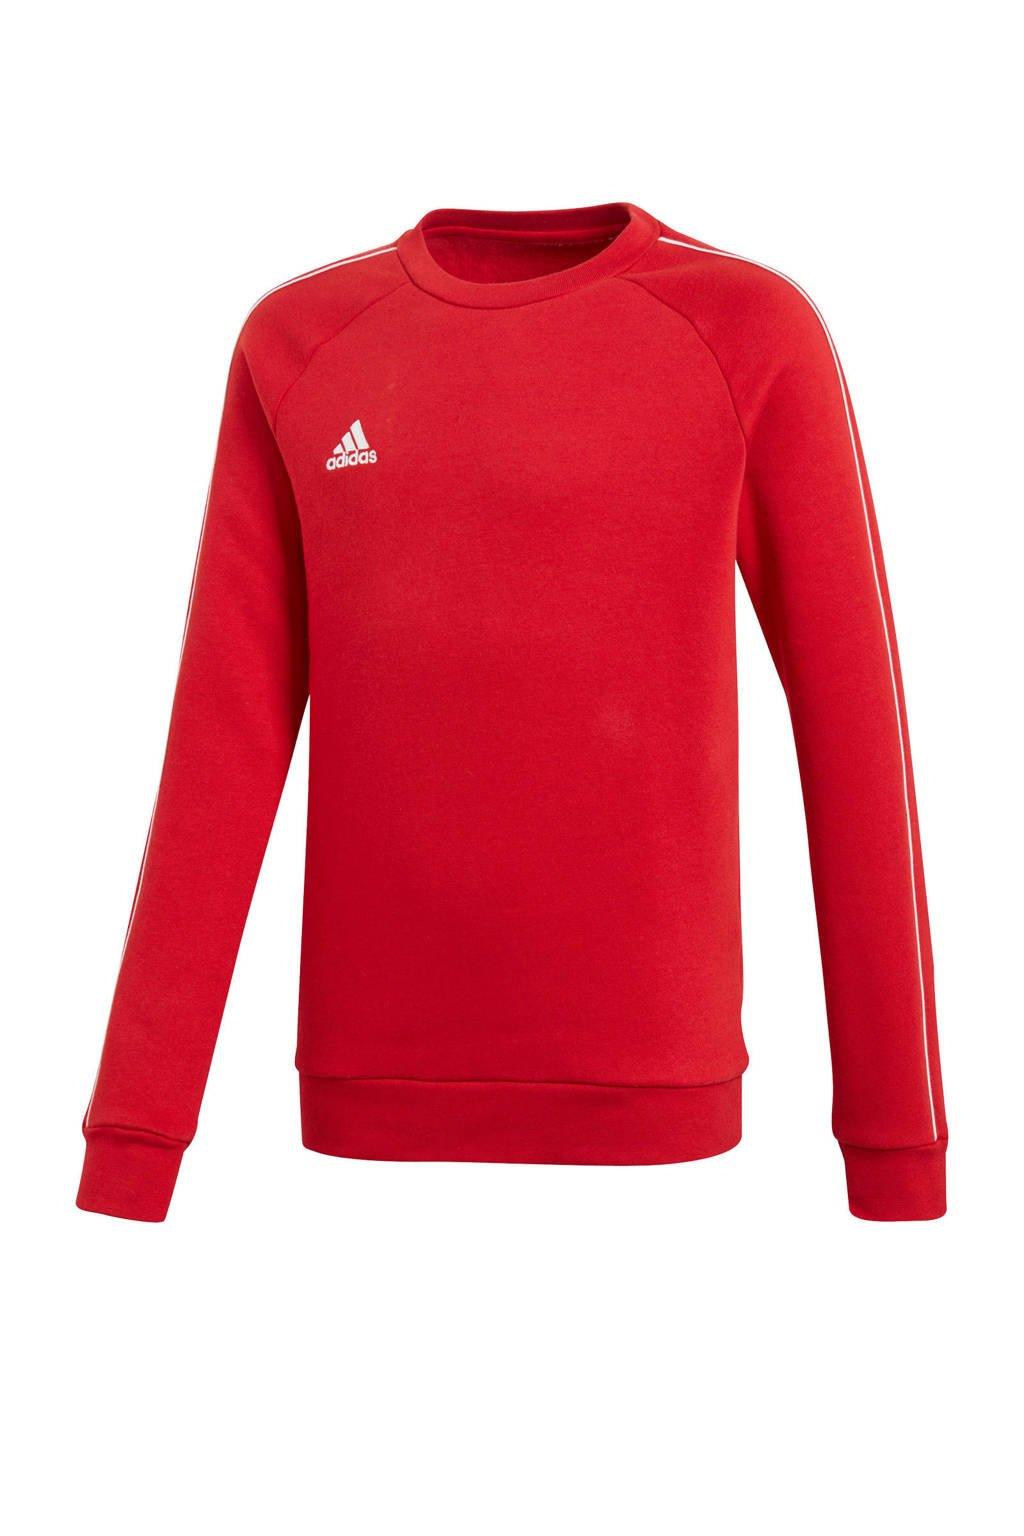 adidas performance   sportsweater rood, Rood/wit